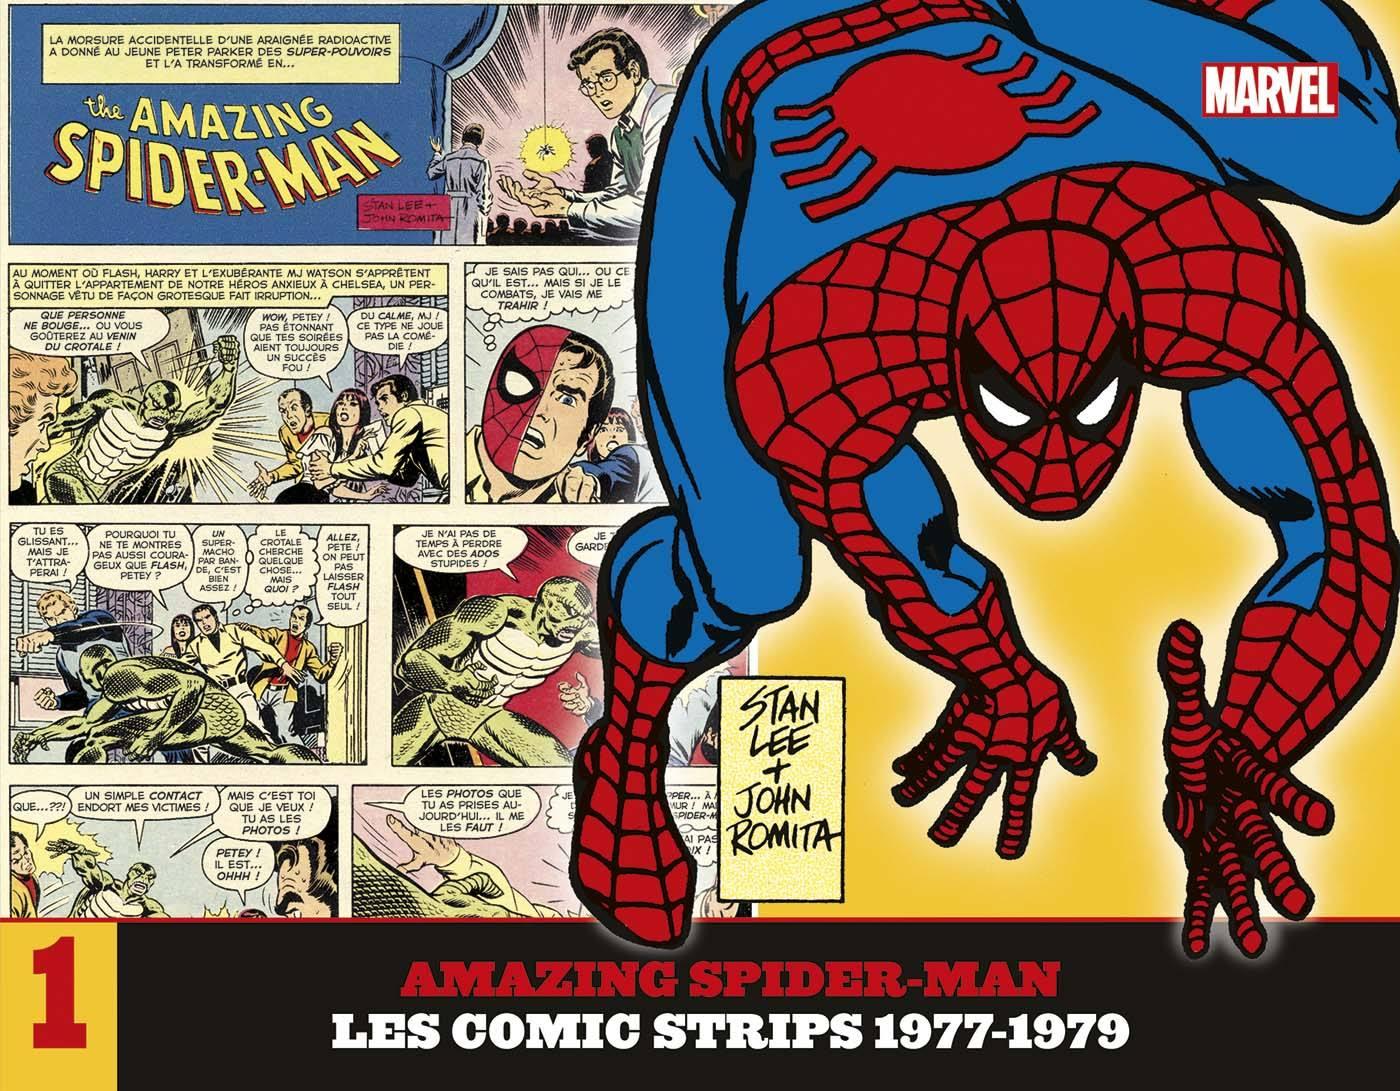 Amazing Spider-Man - Les comic strips 1 - 1977-1979